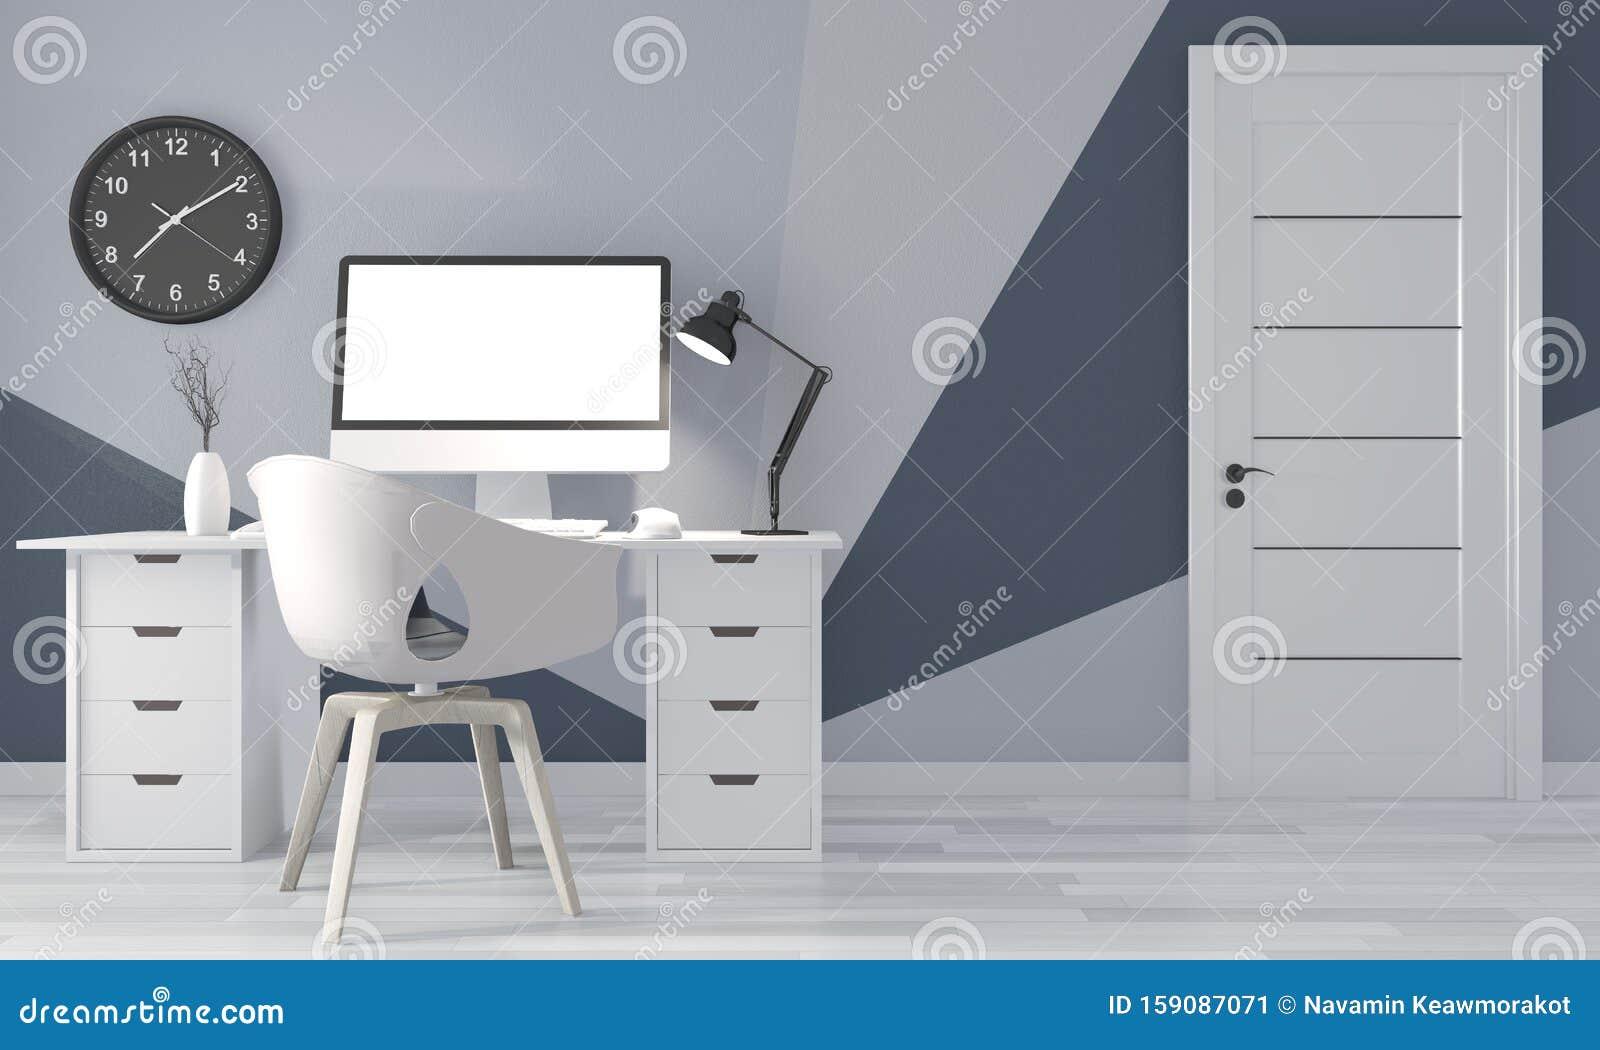 Mock Up Ideas Of Office Room Blue Geometric Wall Art Paint Design Color Ful On Wooden Floor 3d Rendering Stock Illustration Illustration Of Curtain Desk 159087071